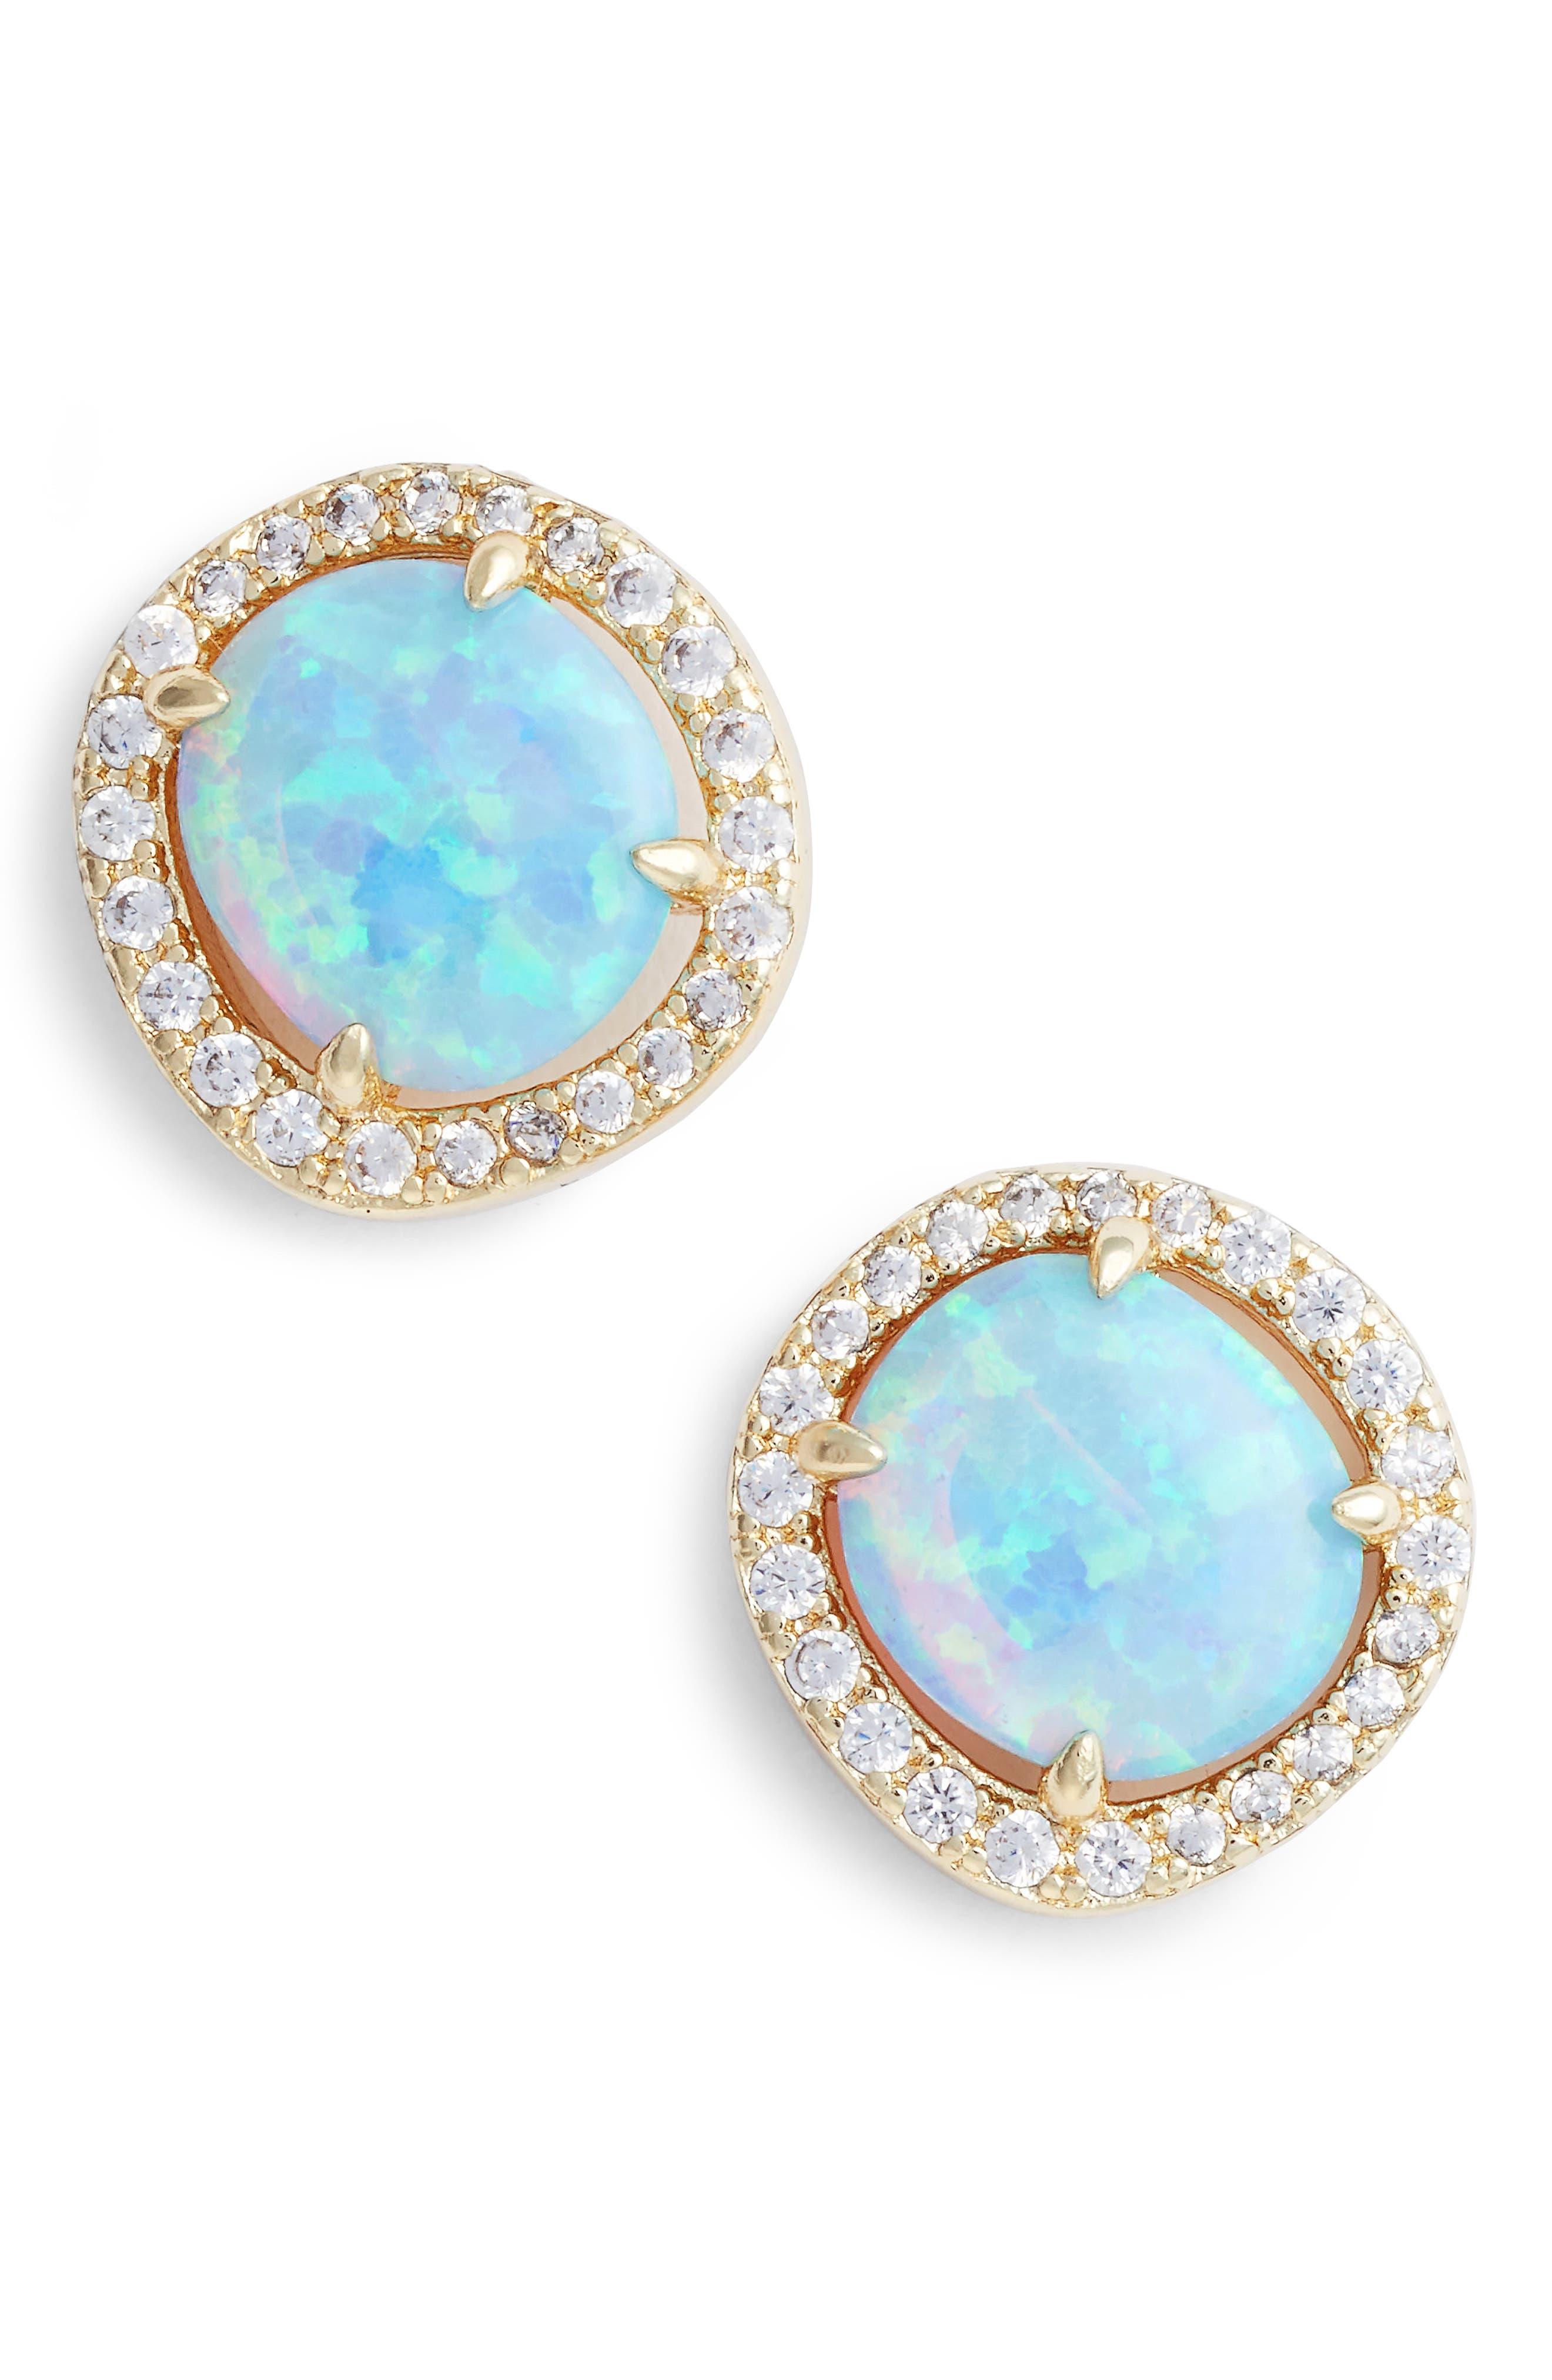 Alternate Image 1 Selected - Melinda Maria Sarah Louise Opal Stud Earrings